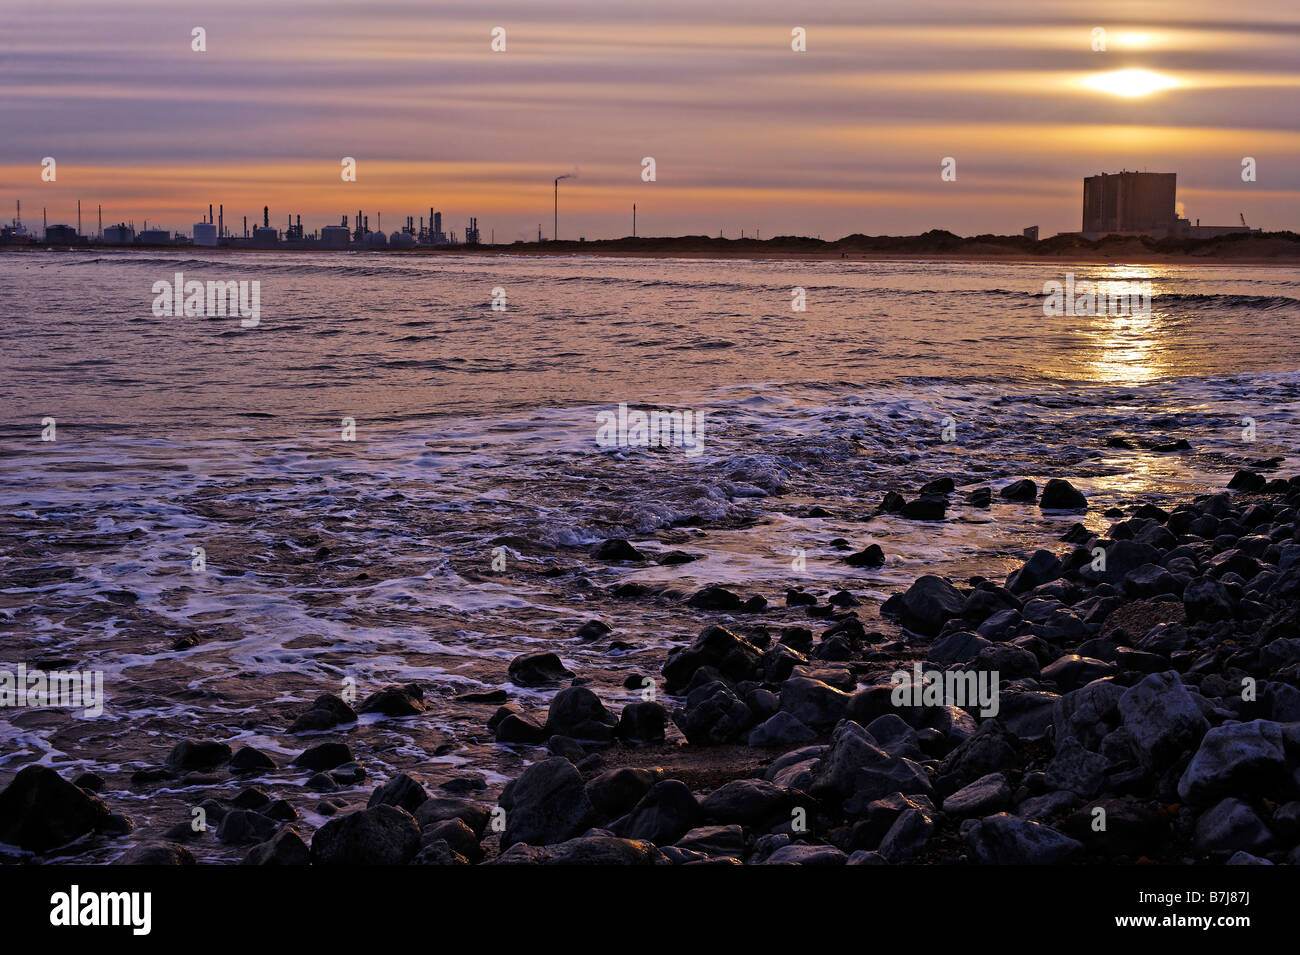 Industrial shoreline at Teeside - Stock Image